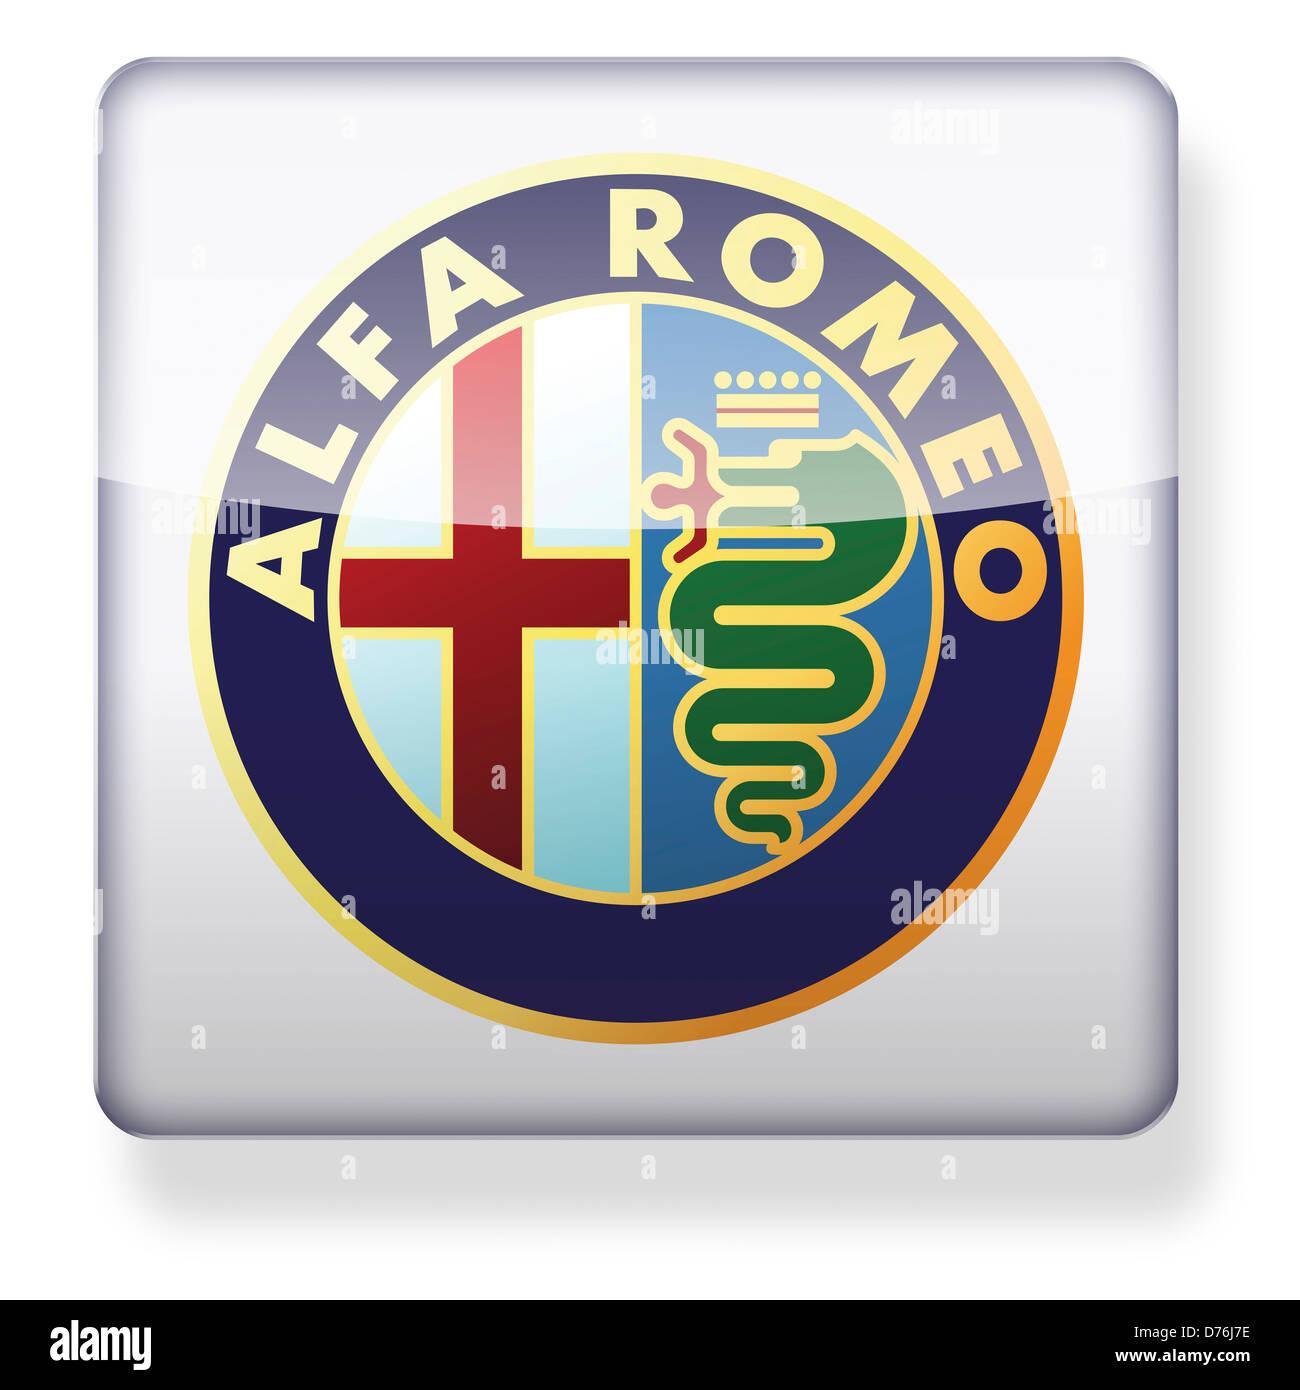 Alfa Romeo Stock Photos & Alfa Romeo Stock Images